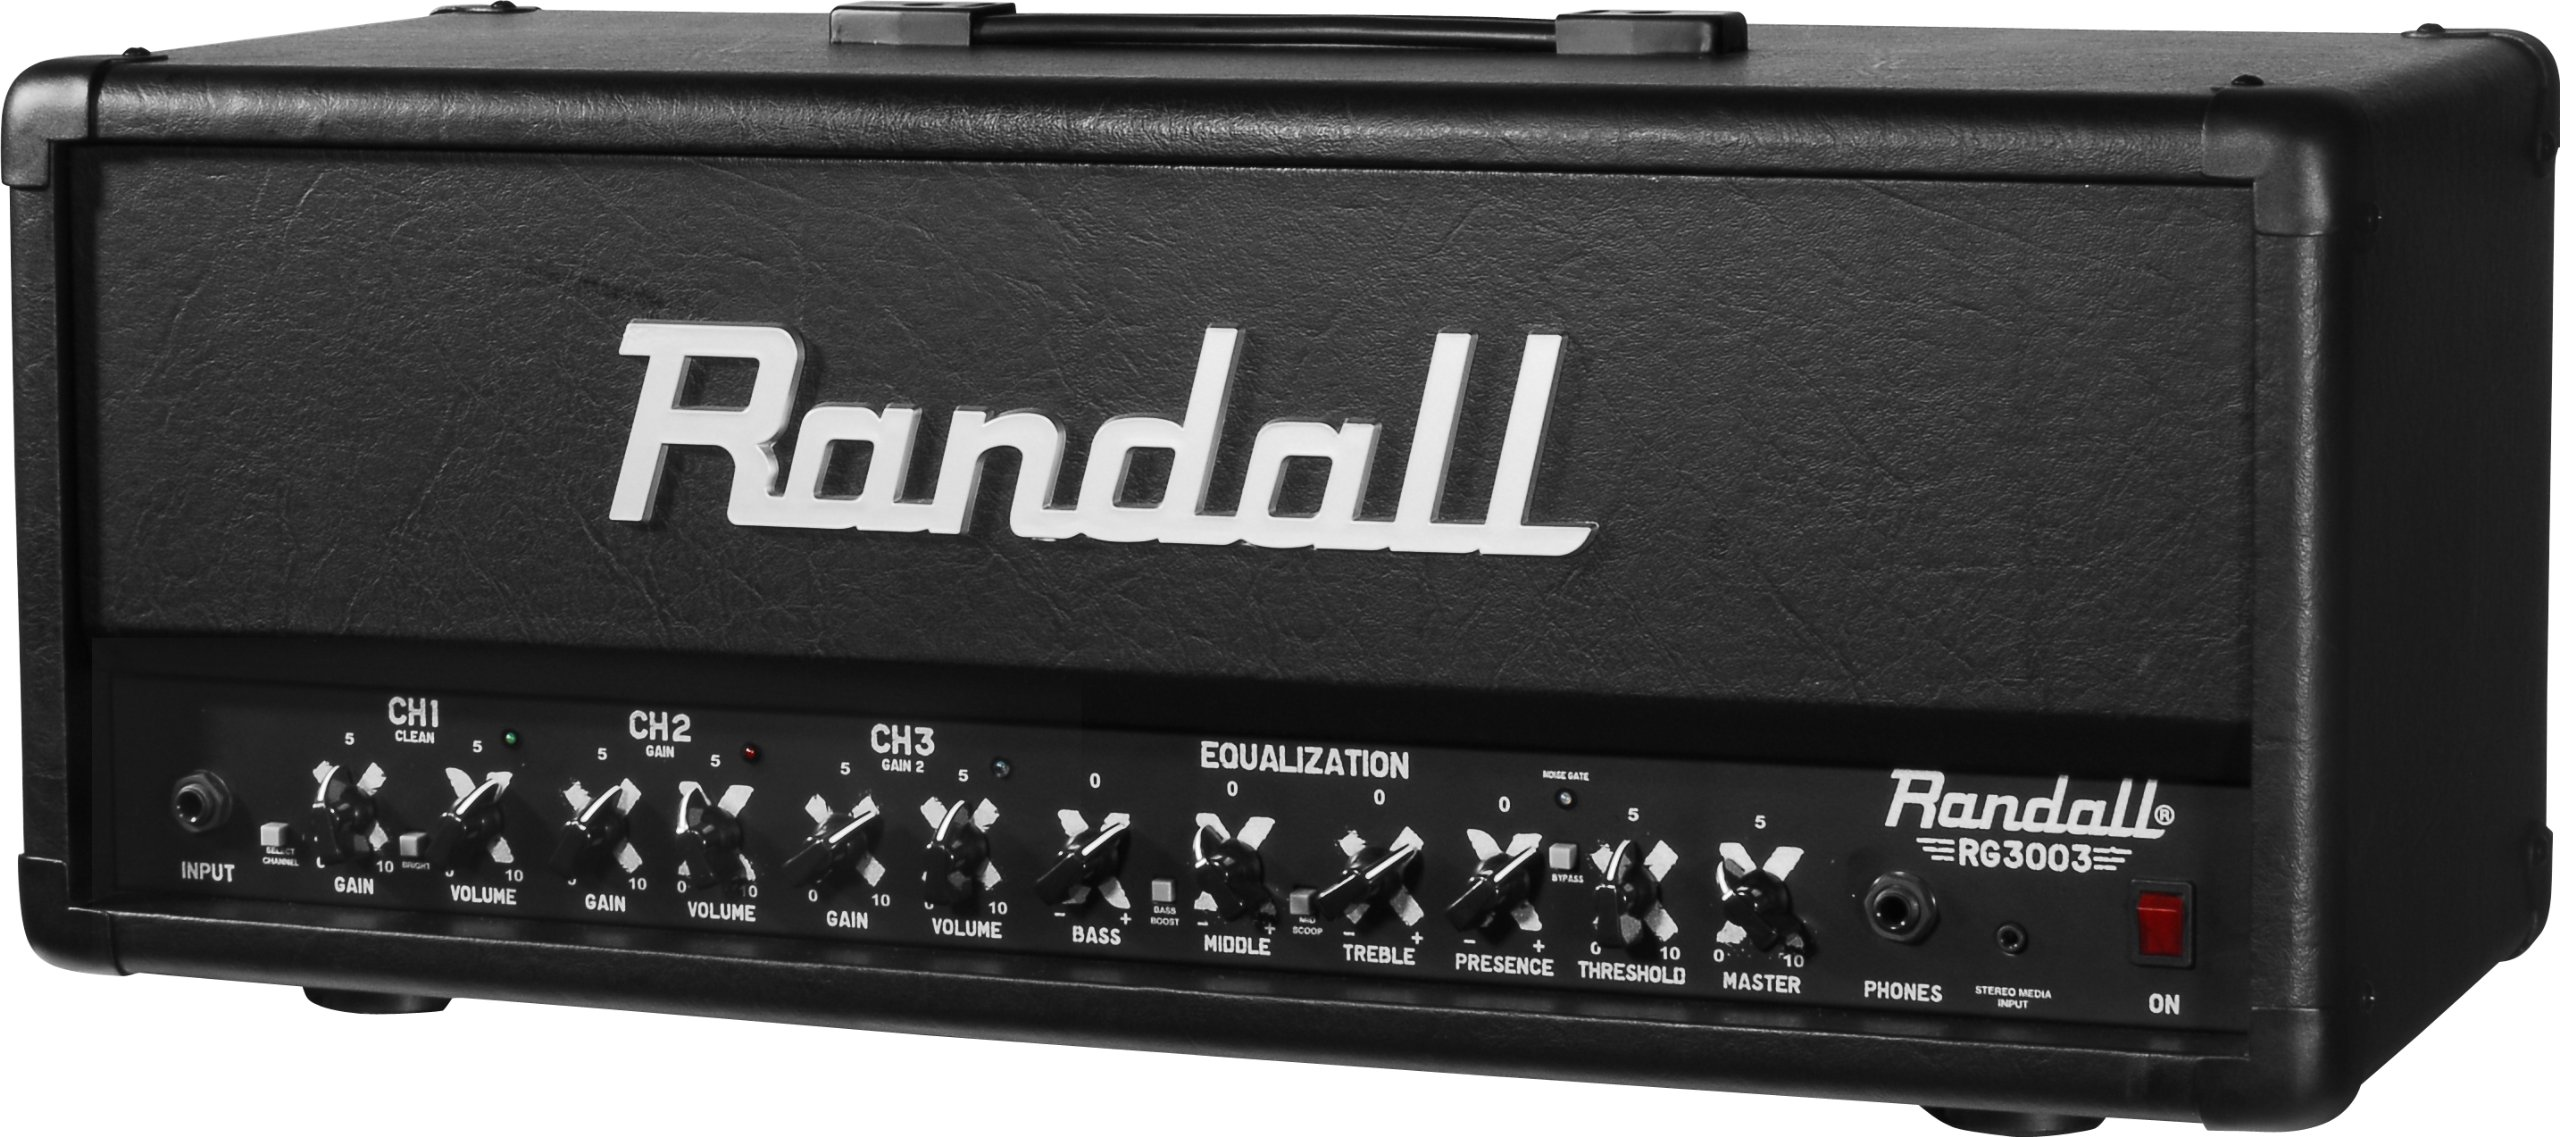 Randall RG3003H RG Series Amplifier Head